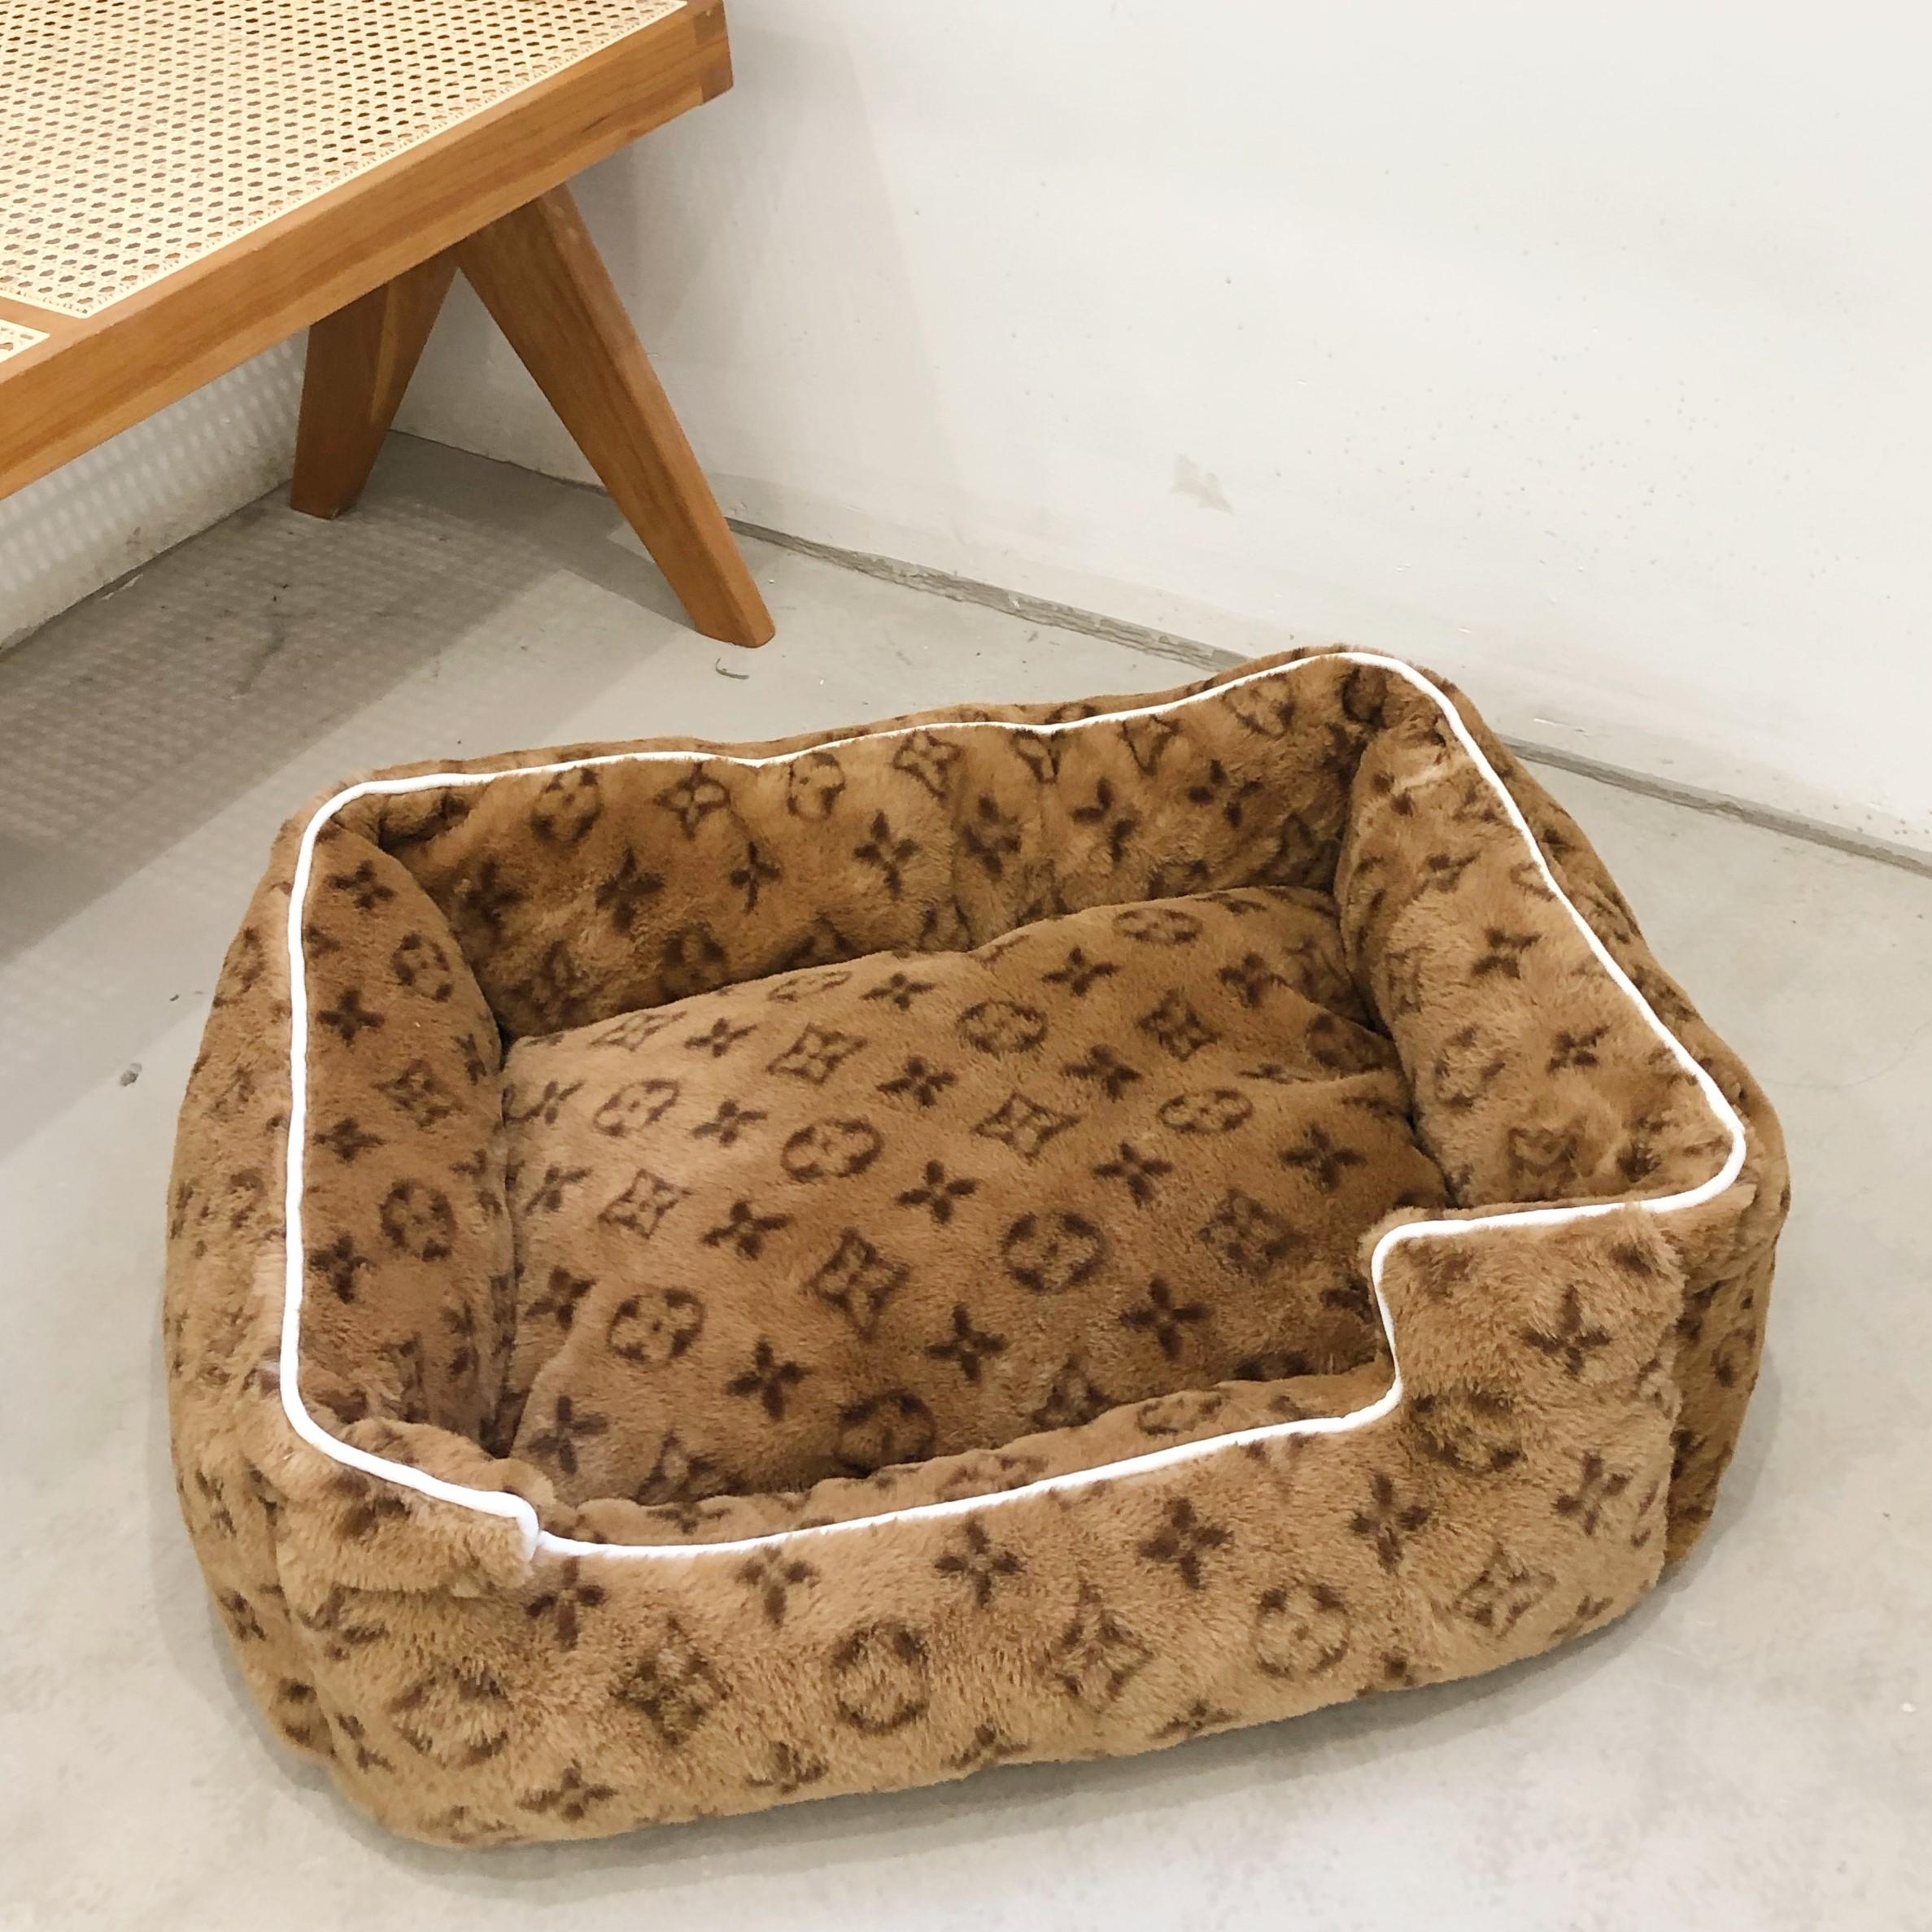 Pawzz Designer Cozy Dog Bed